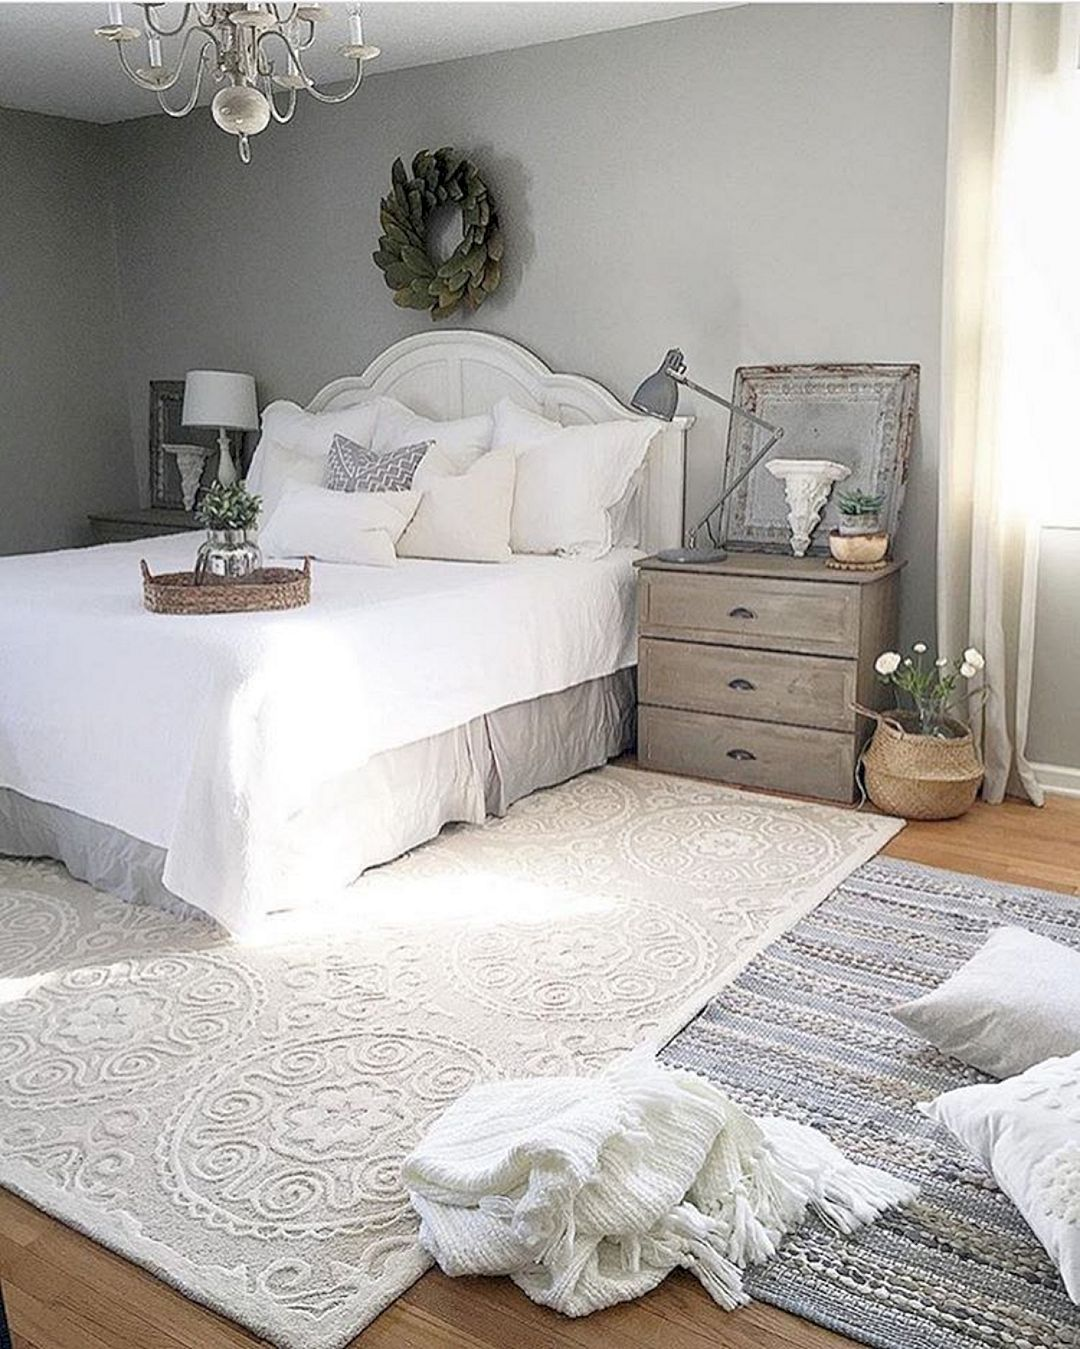 137 Diy Rustic And Romantic Master Bedroom Ideas On A Budget Bedroom Decor Inspiration Home Decor Bedroom Bedroom Design